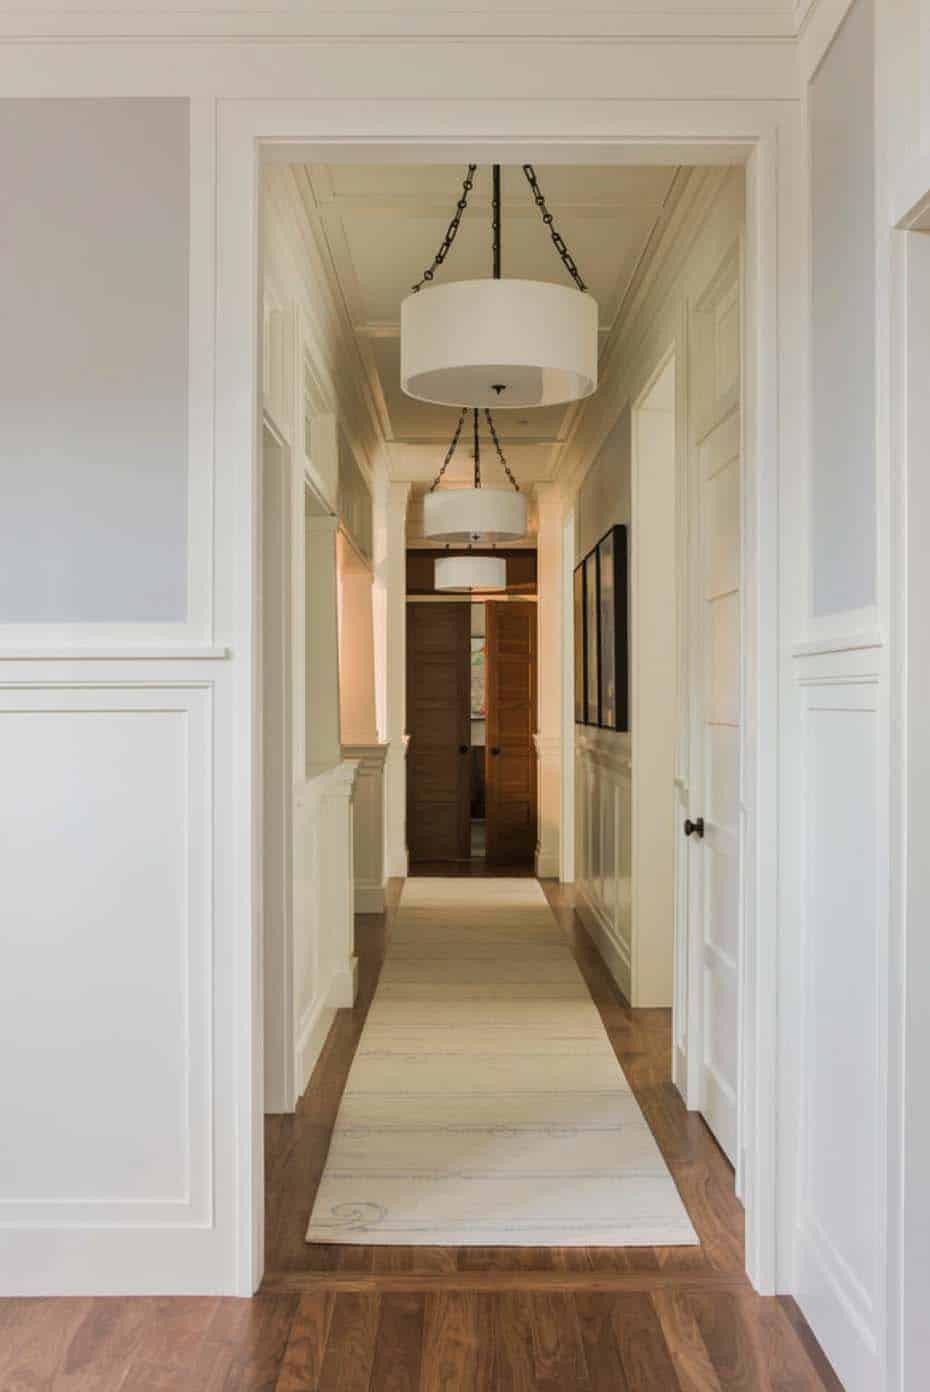 Hilltop Gambrel House-LDa Architecture-08-1 Kindesign